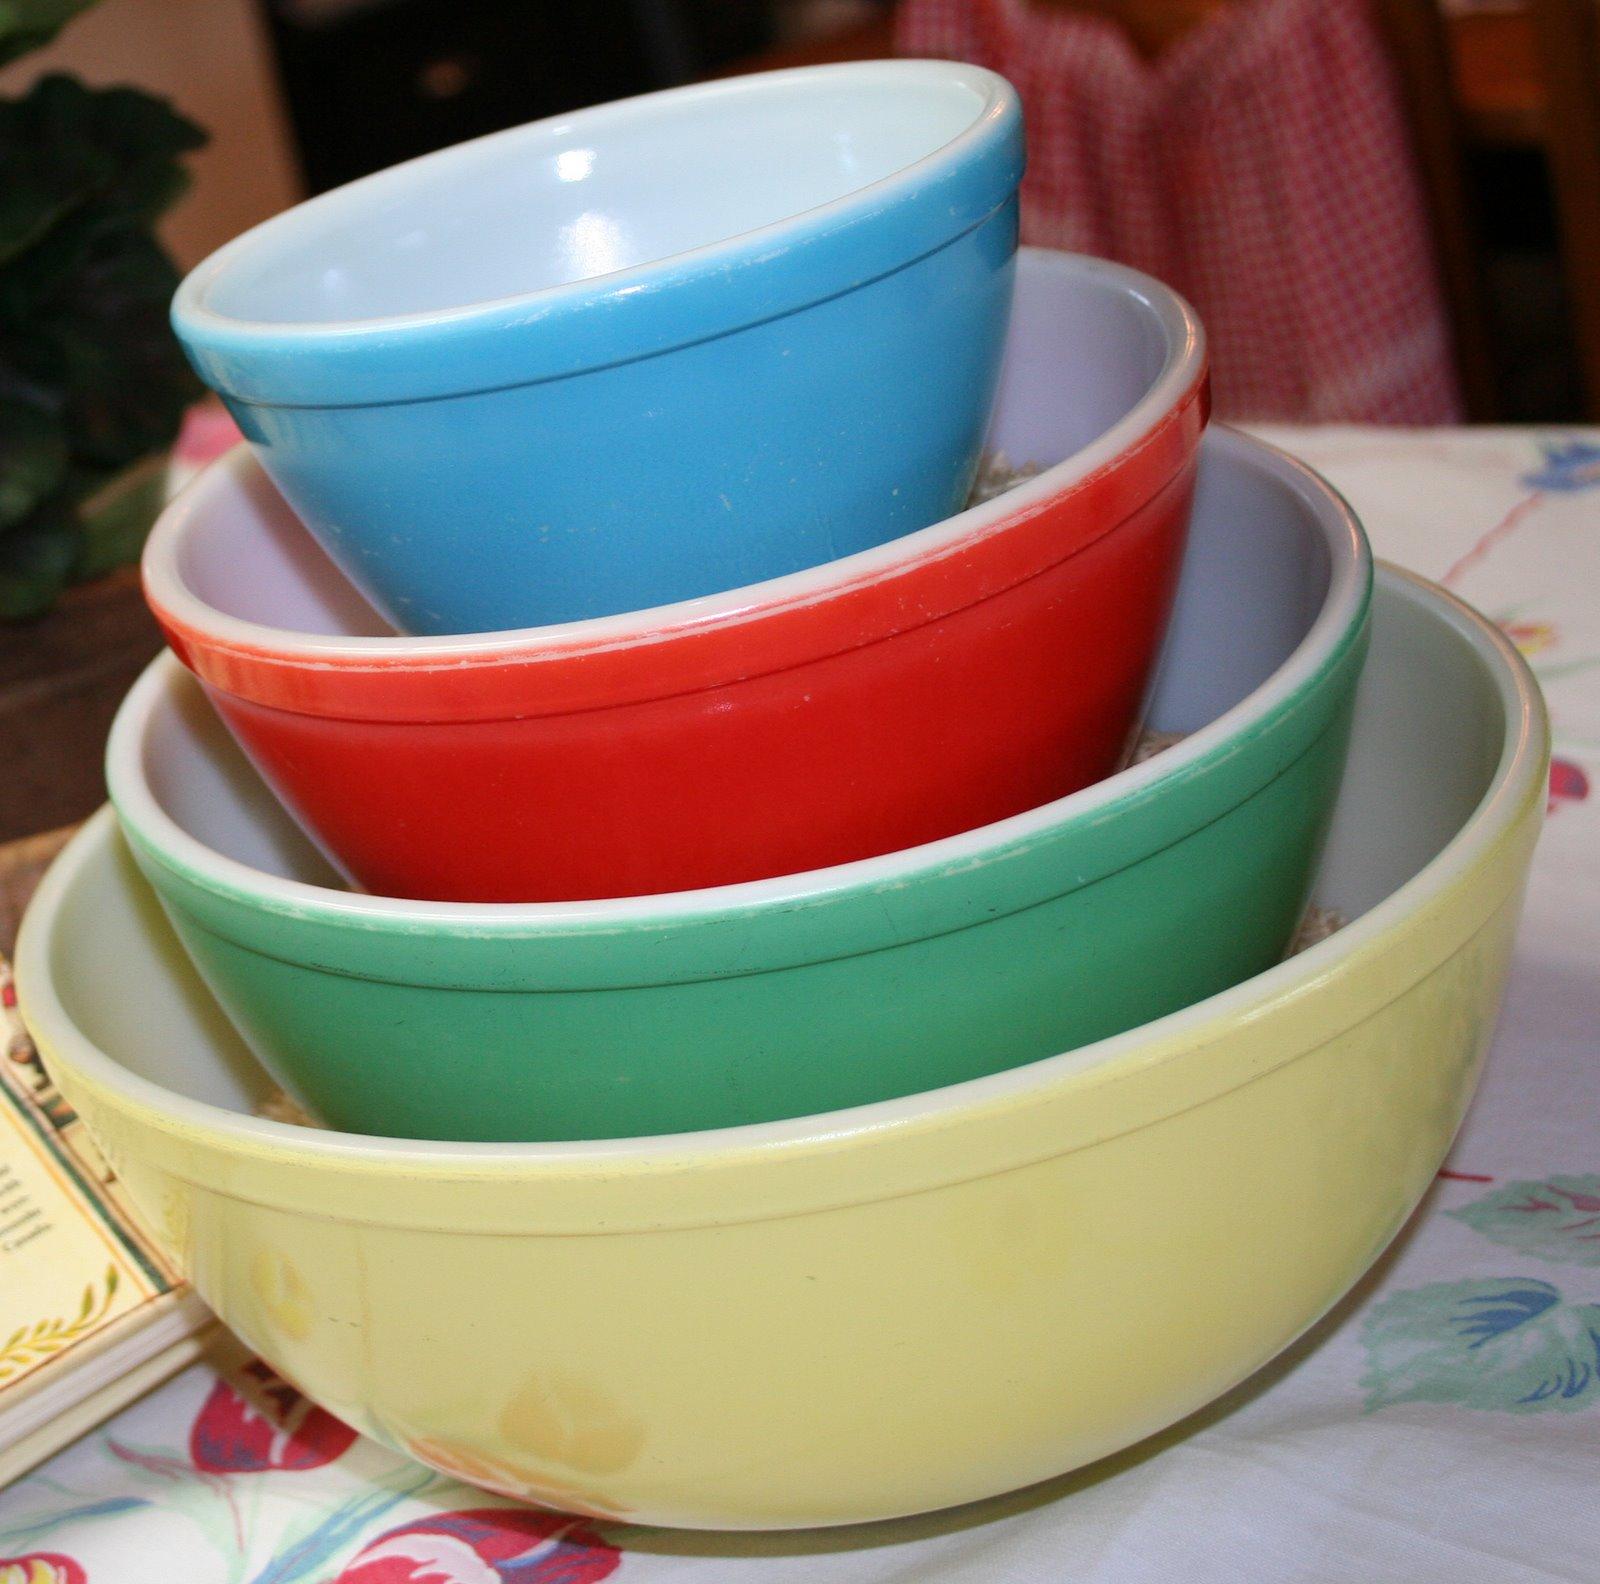 Mennonite Girls Can Cook: The Apron Recipe